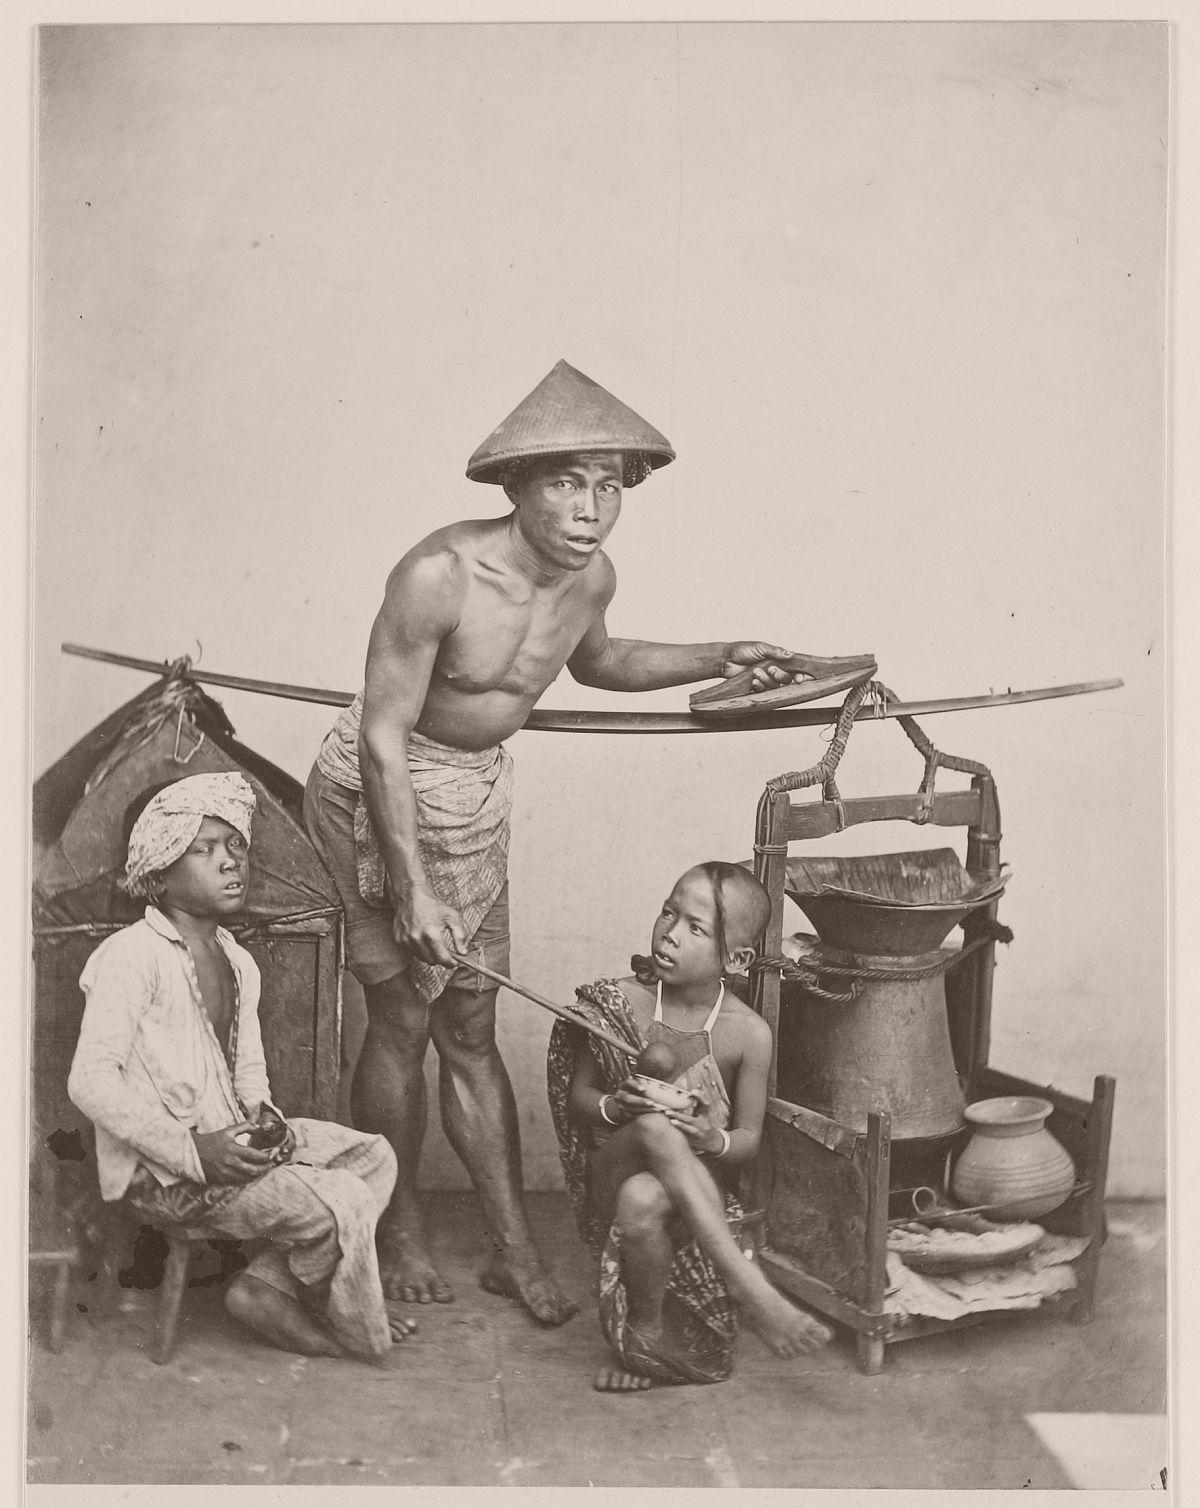 Street vendor in Batavia, circa 1870.